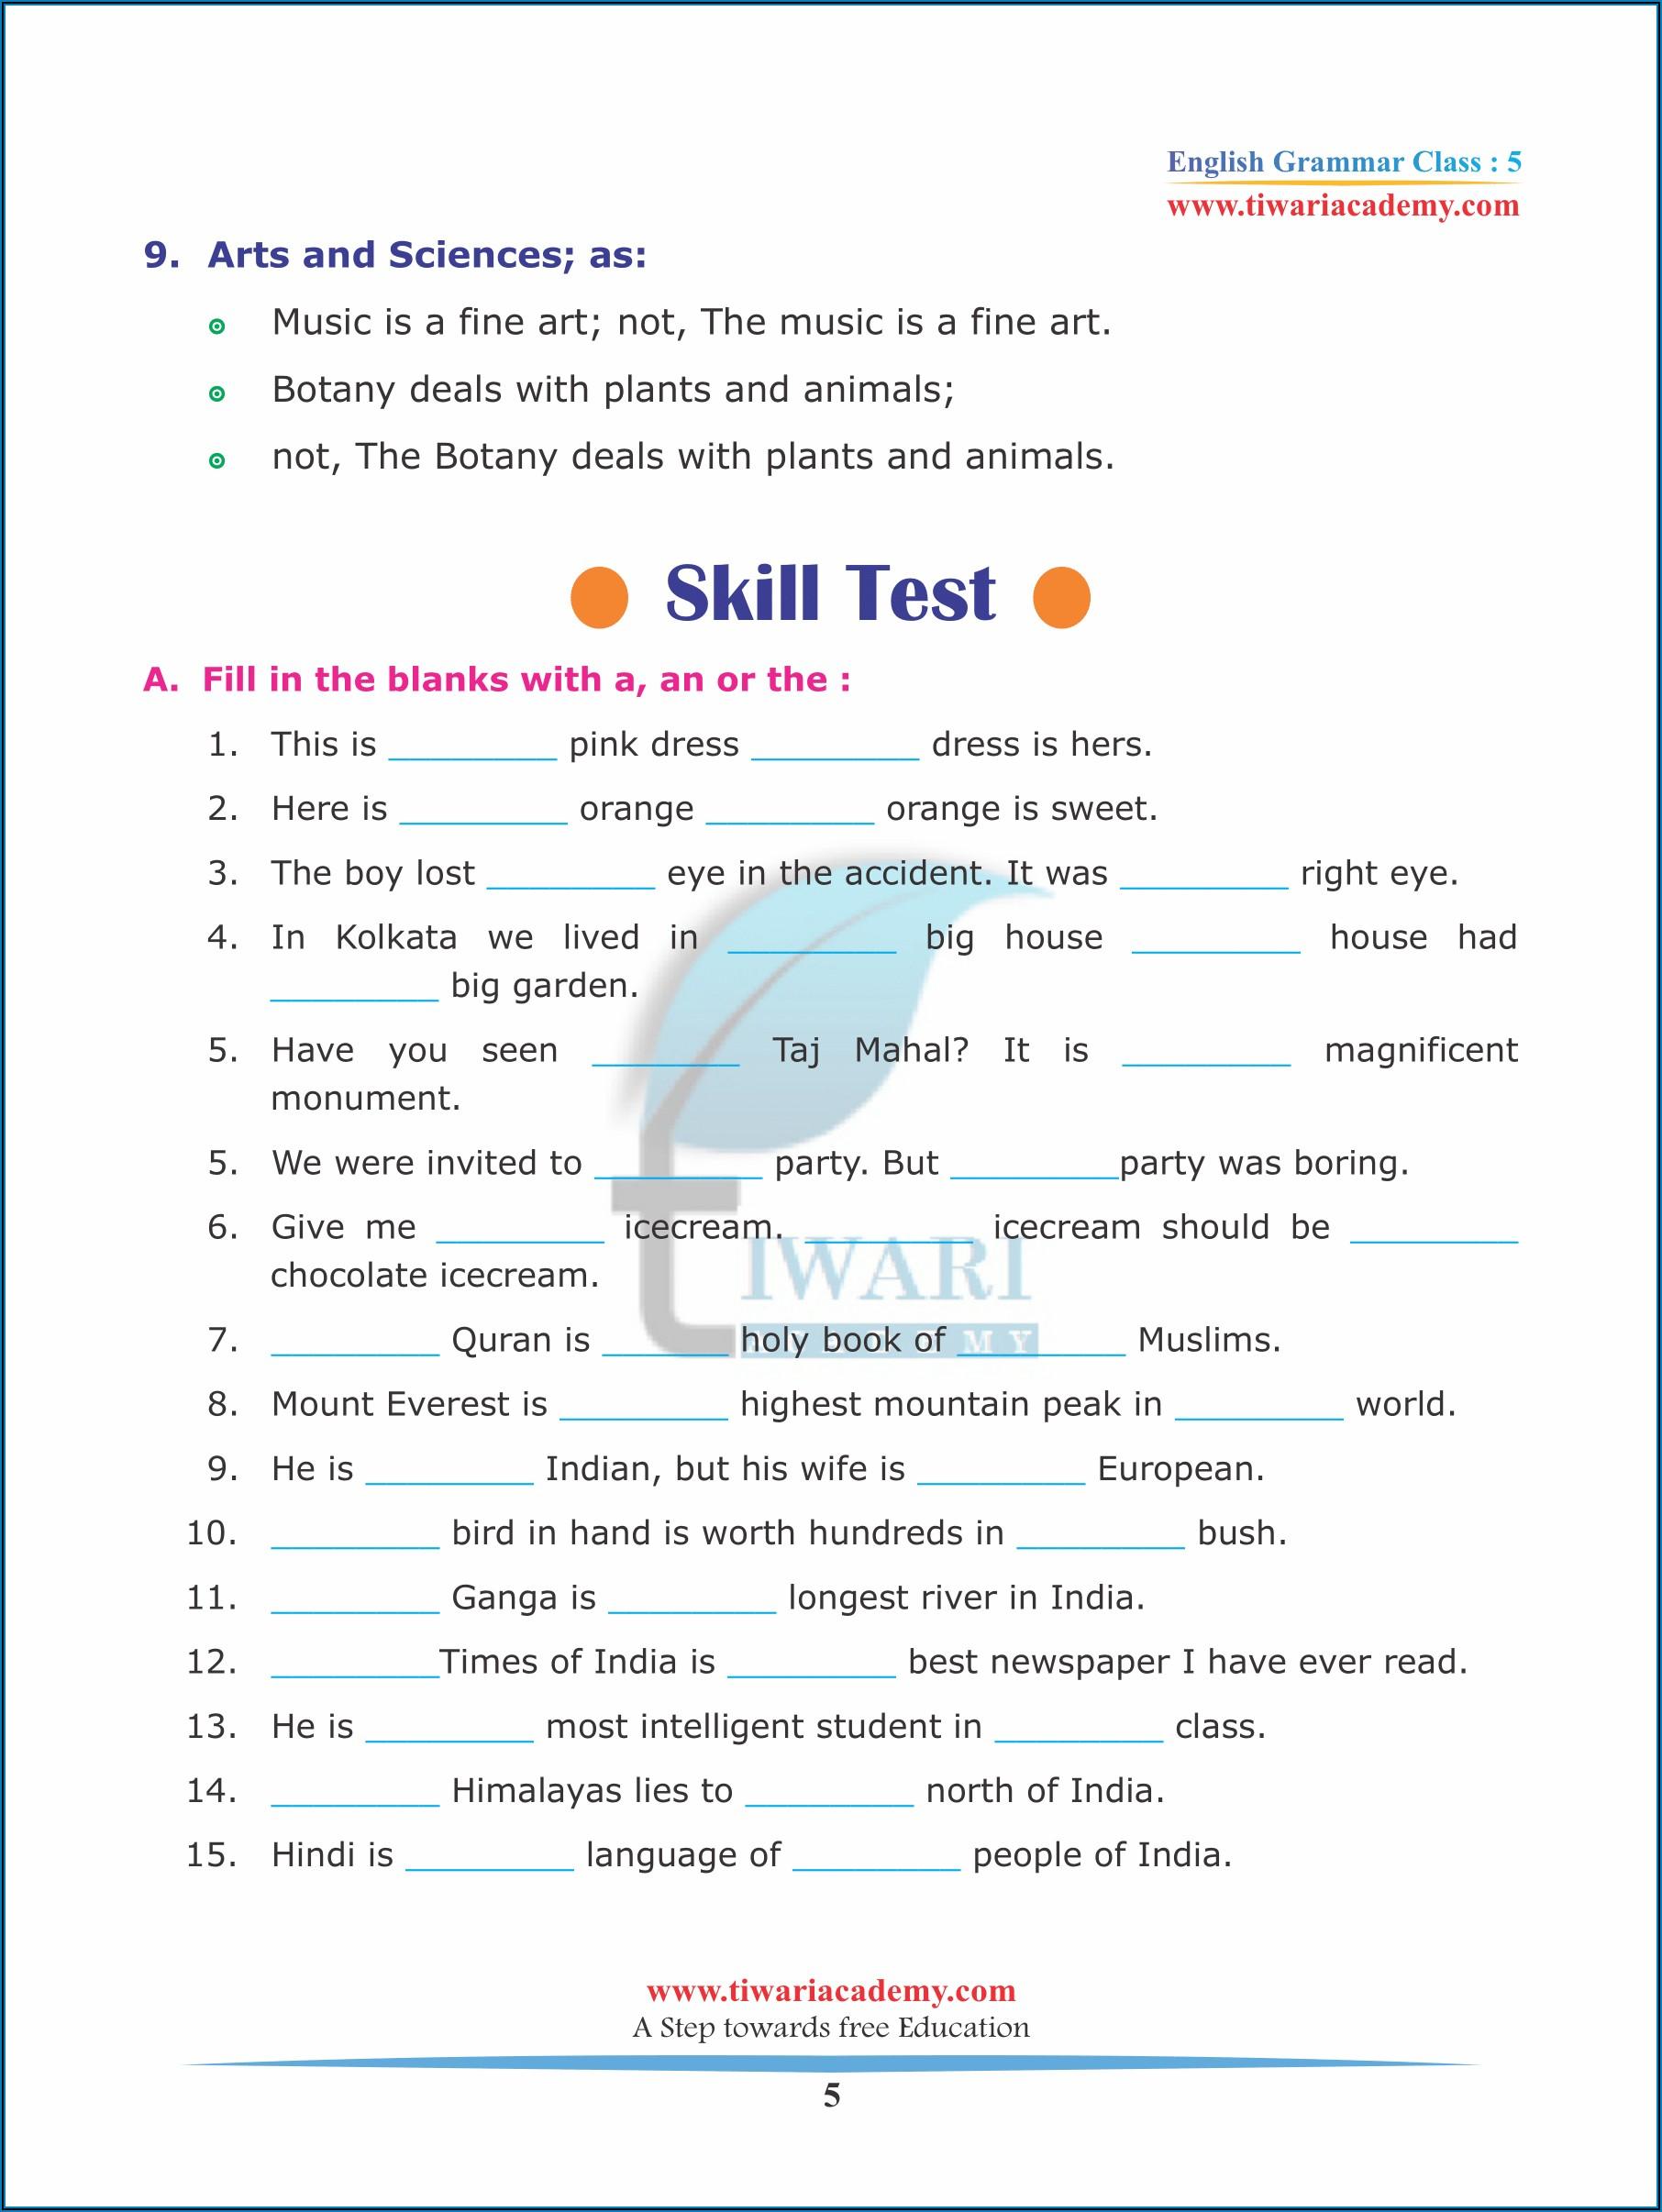 Grade 5 English Grammar Worksheets On Articles